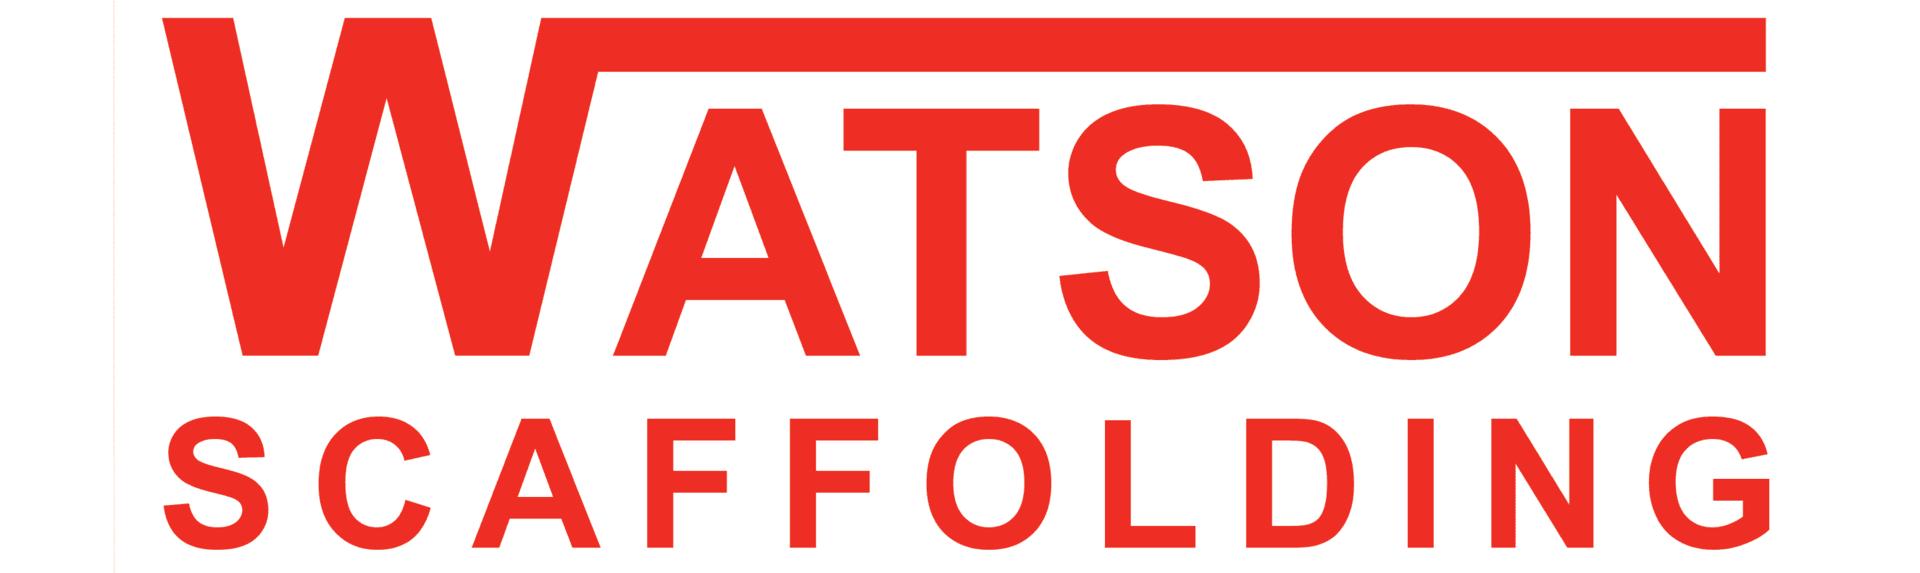 Modern Scaffolding Services logo